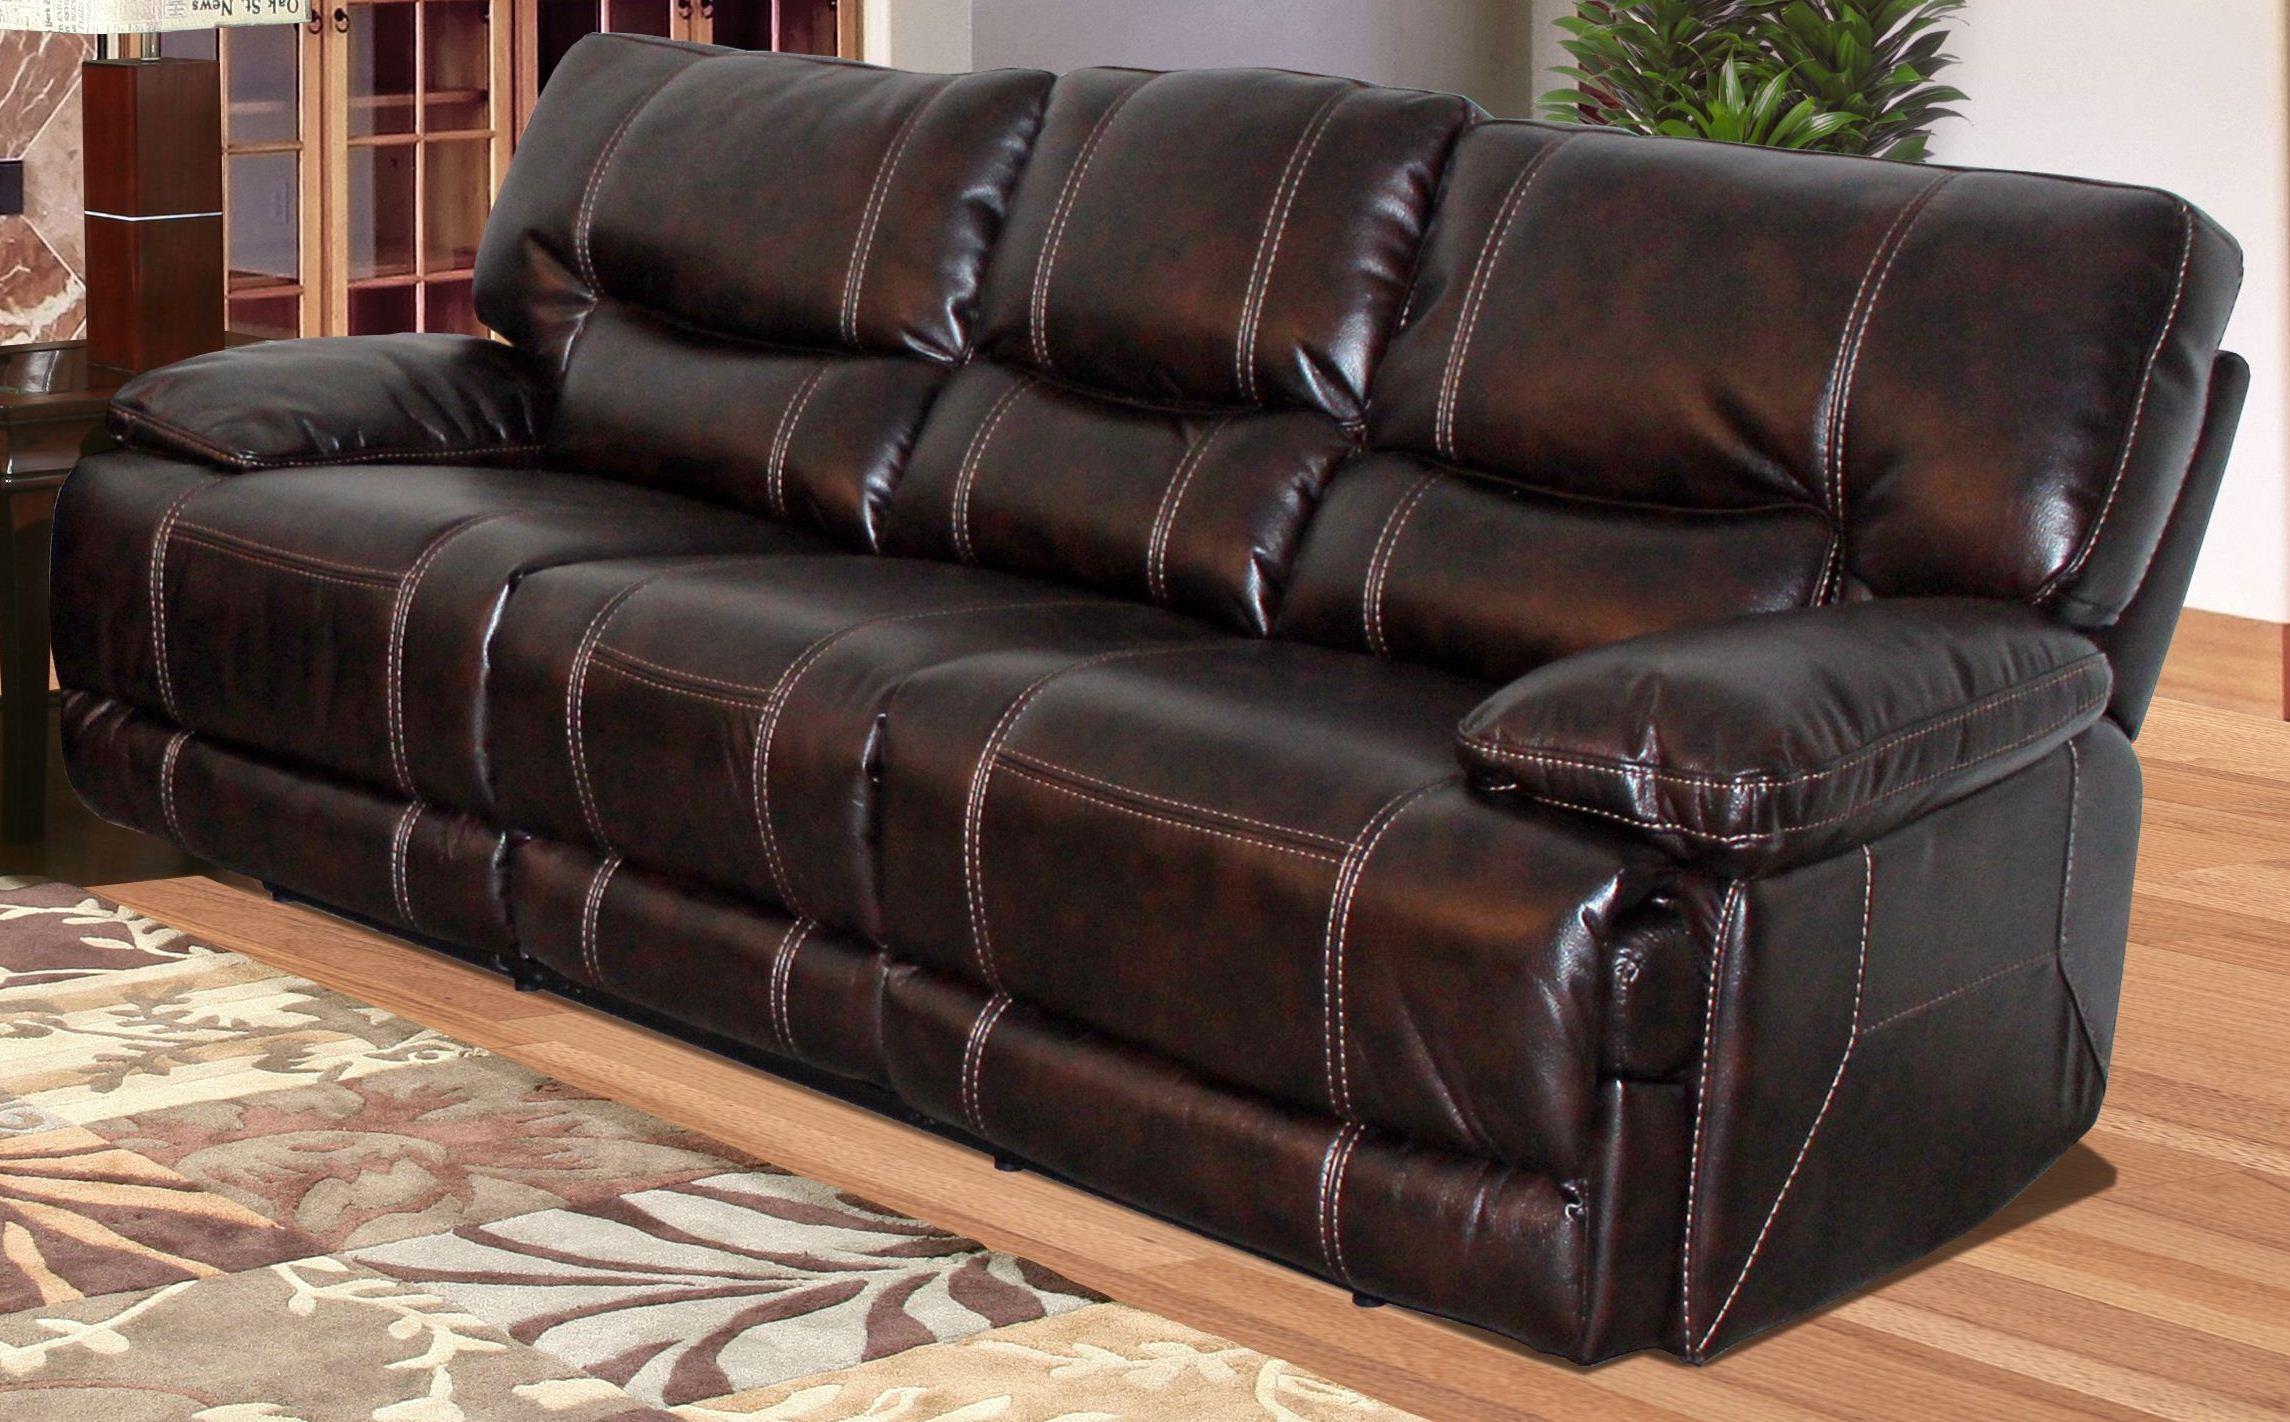 Pegasus Dual Power Reclining Sofa From Renegade Coleman Furniture